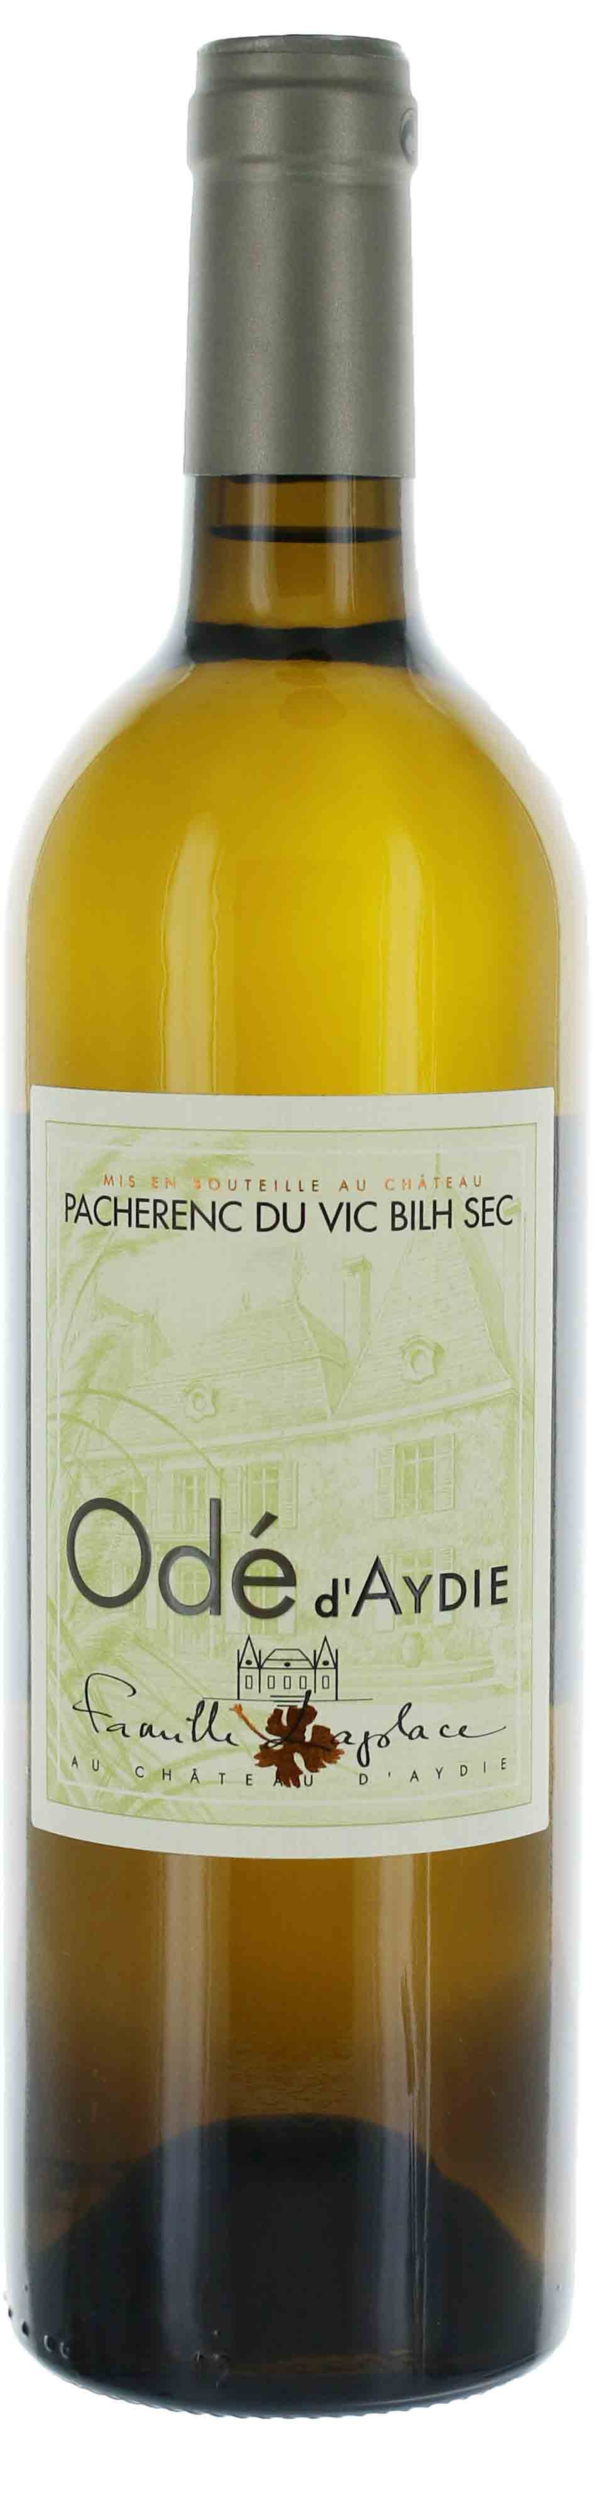 Ode d\'Aydie Pacherenc du Vic - Bilh Blanc sec - Château D\'Aydie - 2017